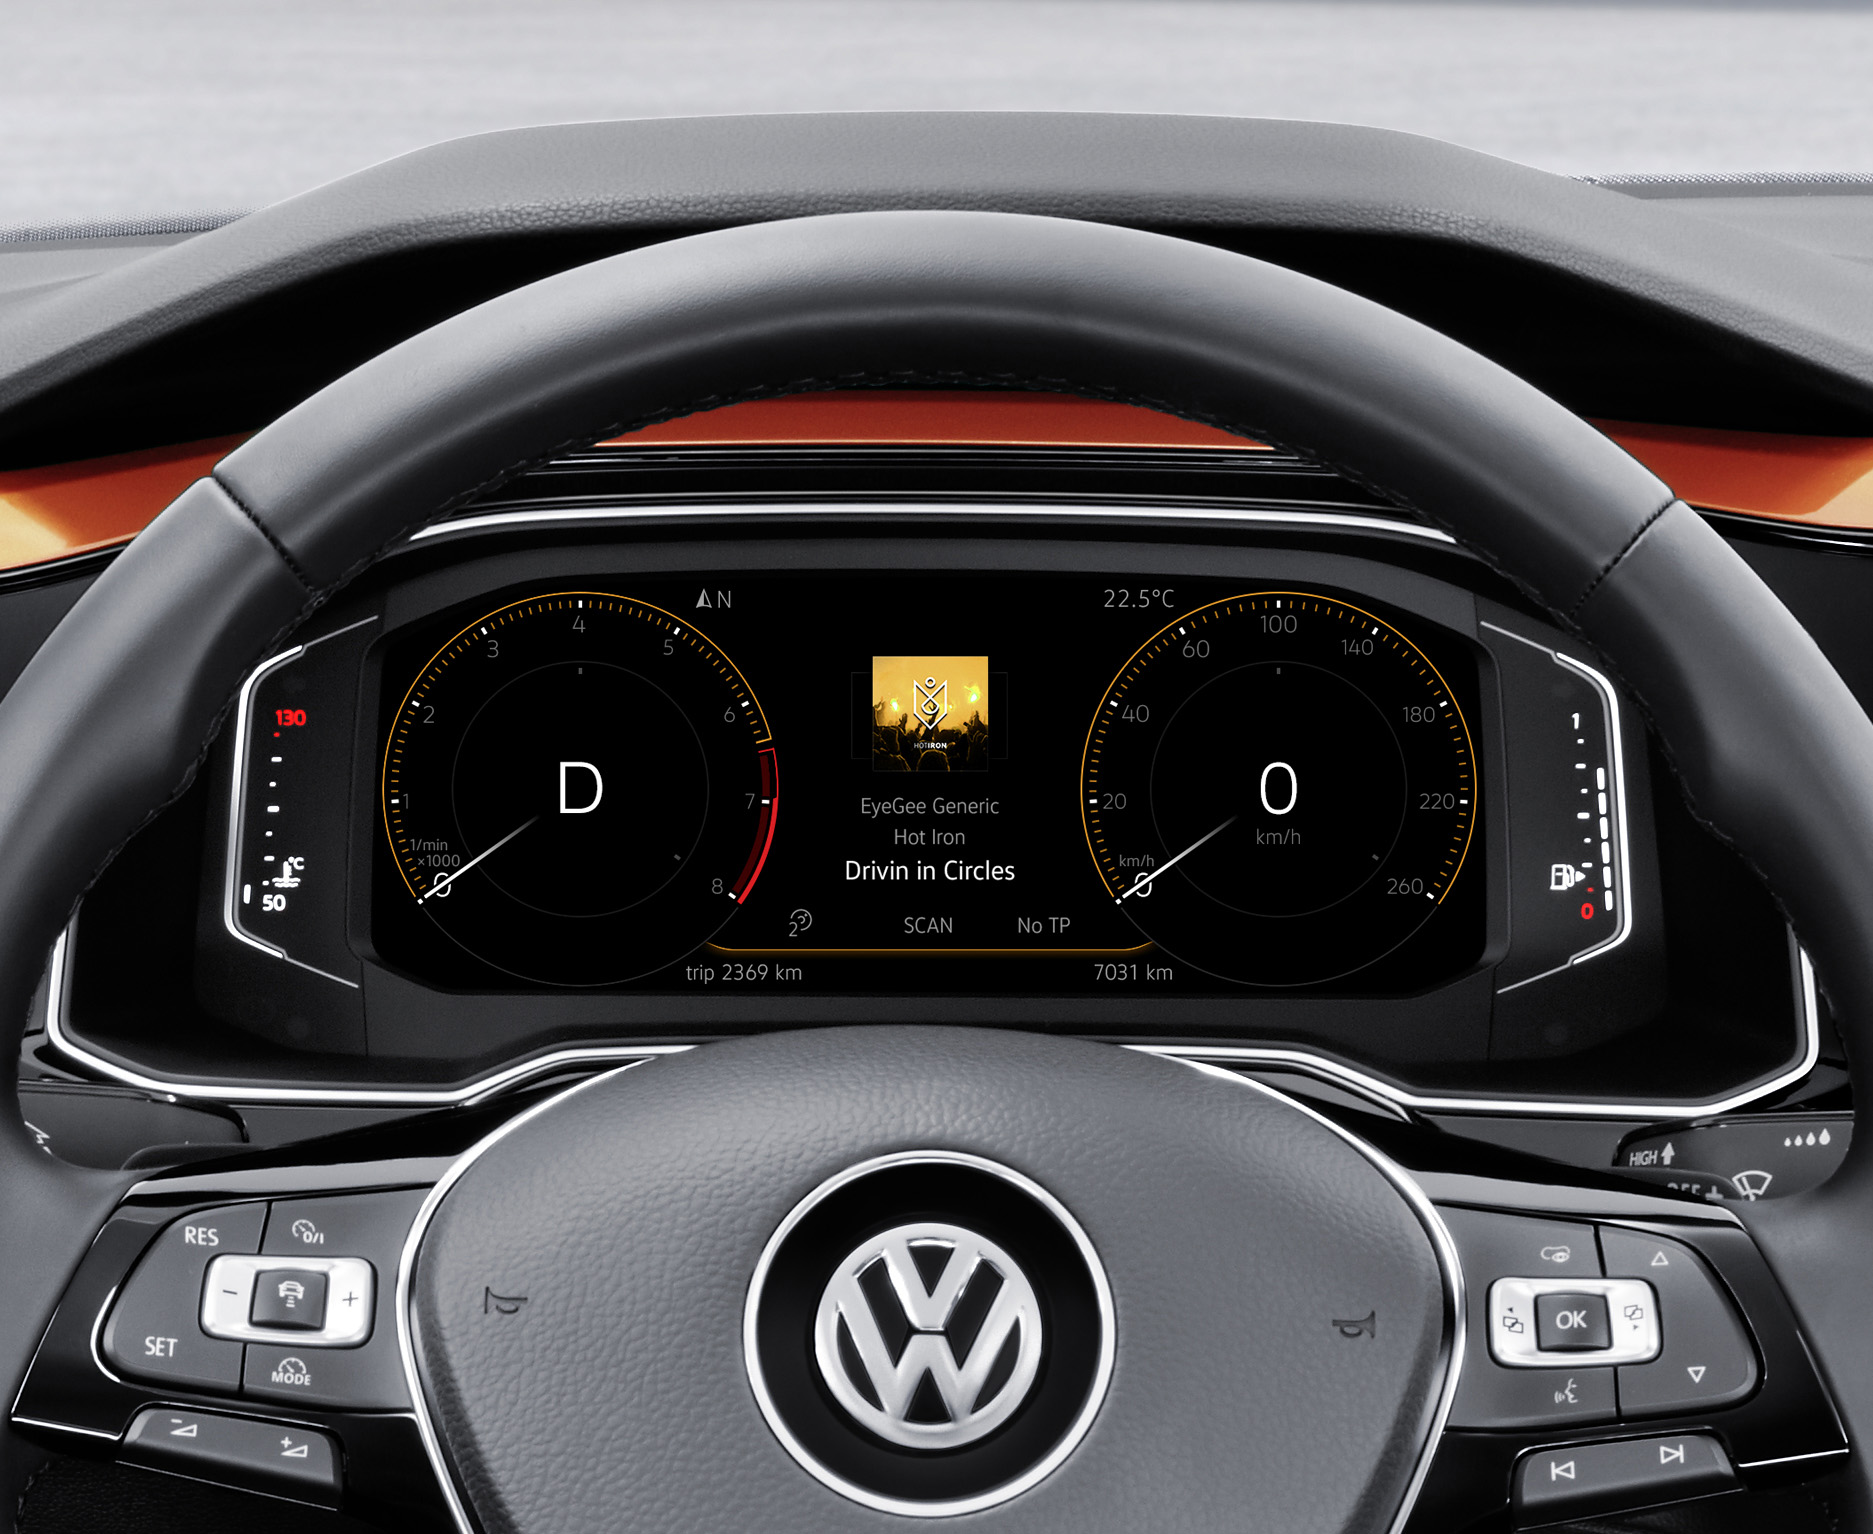 Corolla S 2017 >> 2018 Volkswagen Polo Mk6 gets MQB platform, new Active ...